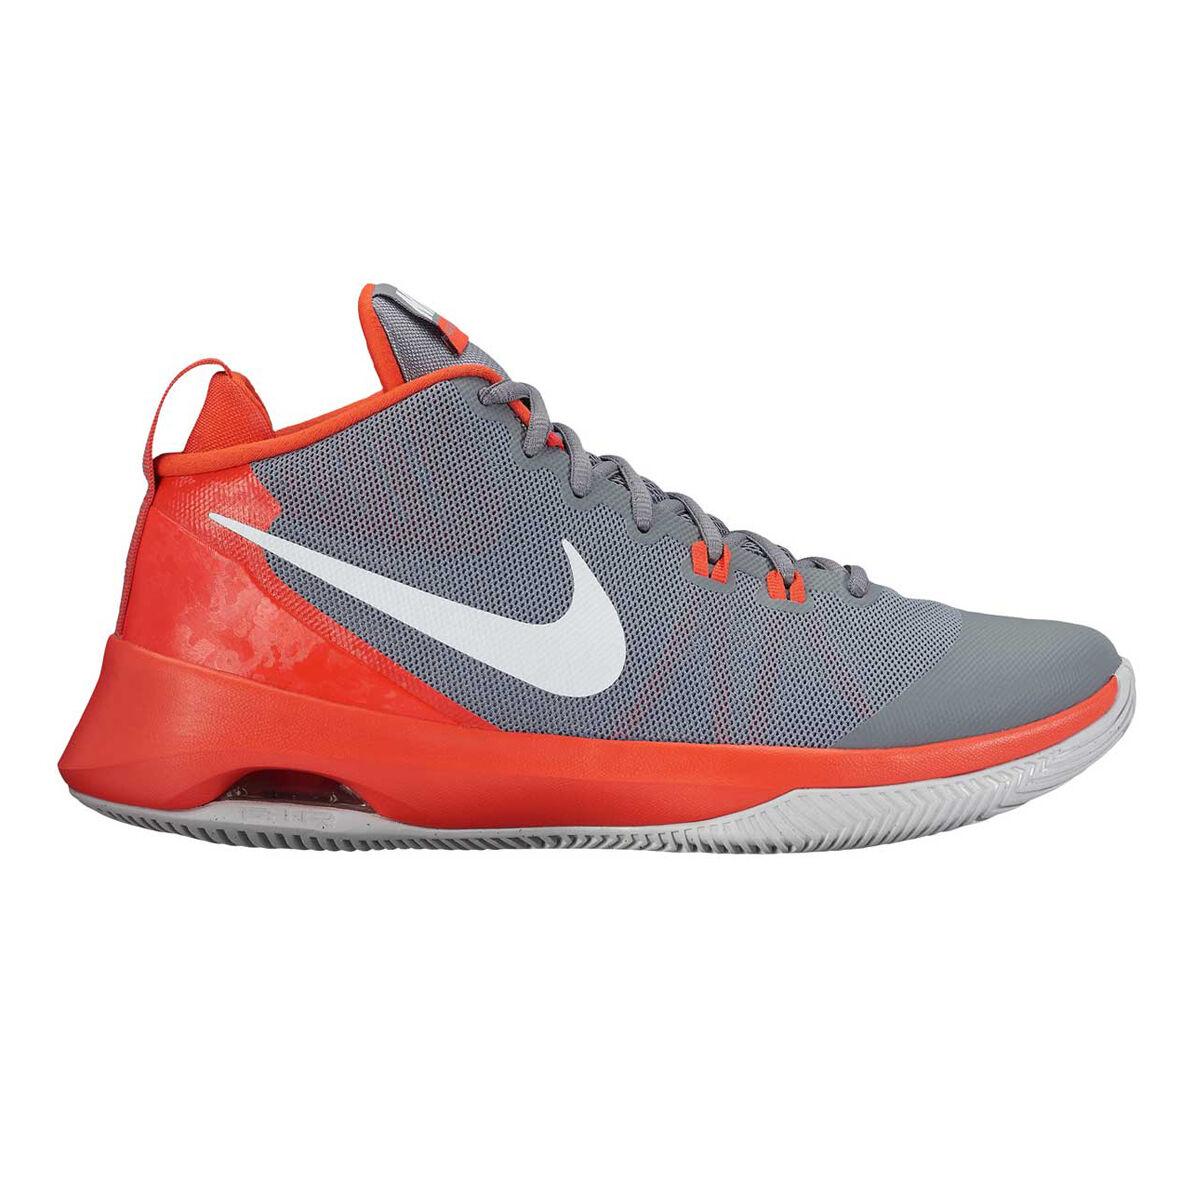 nike air versatile mens basketball shoes grey orange us 8 5 rh rebelsport com au